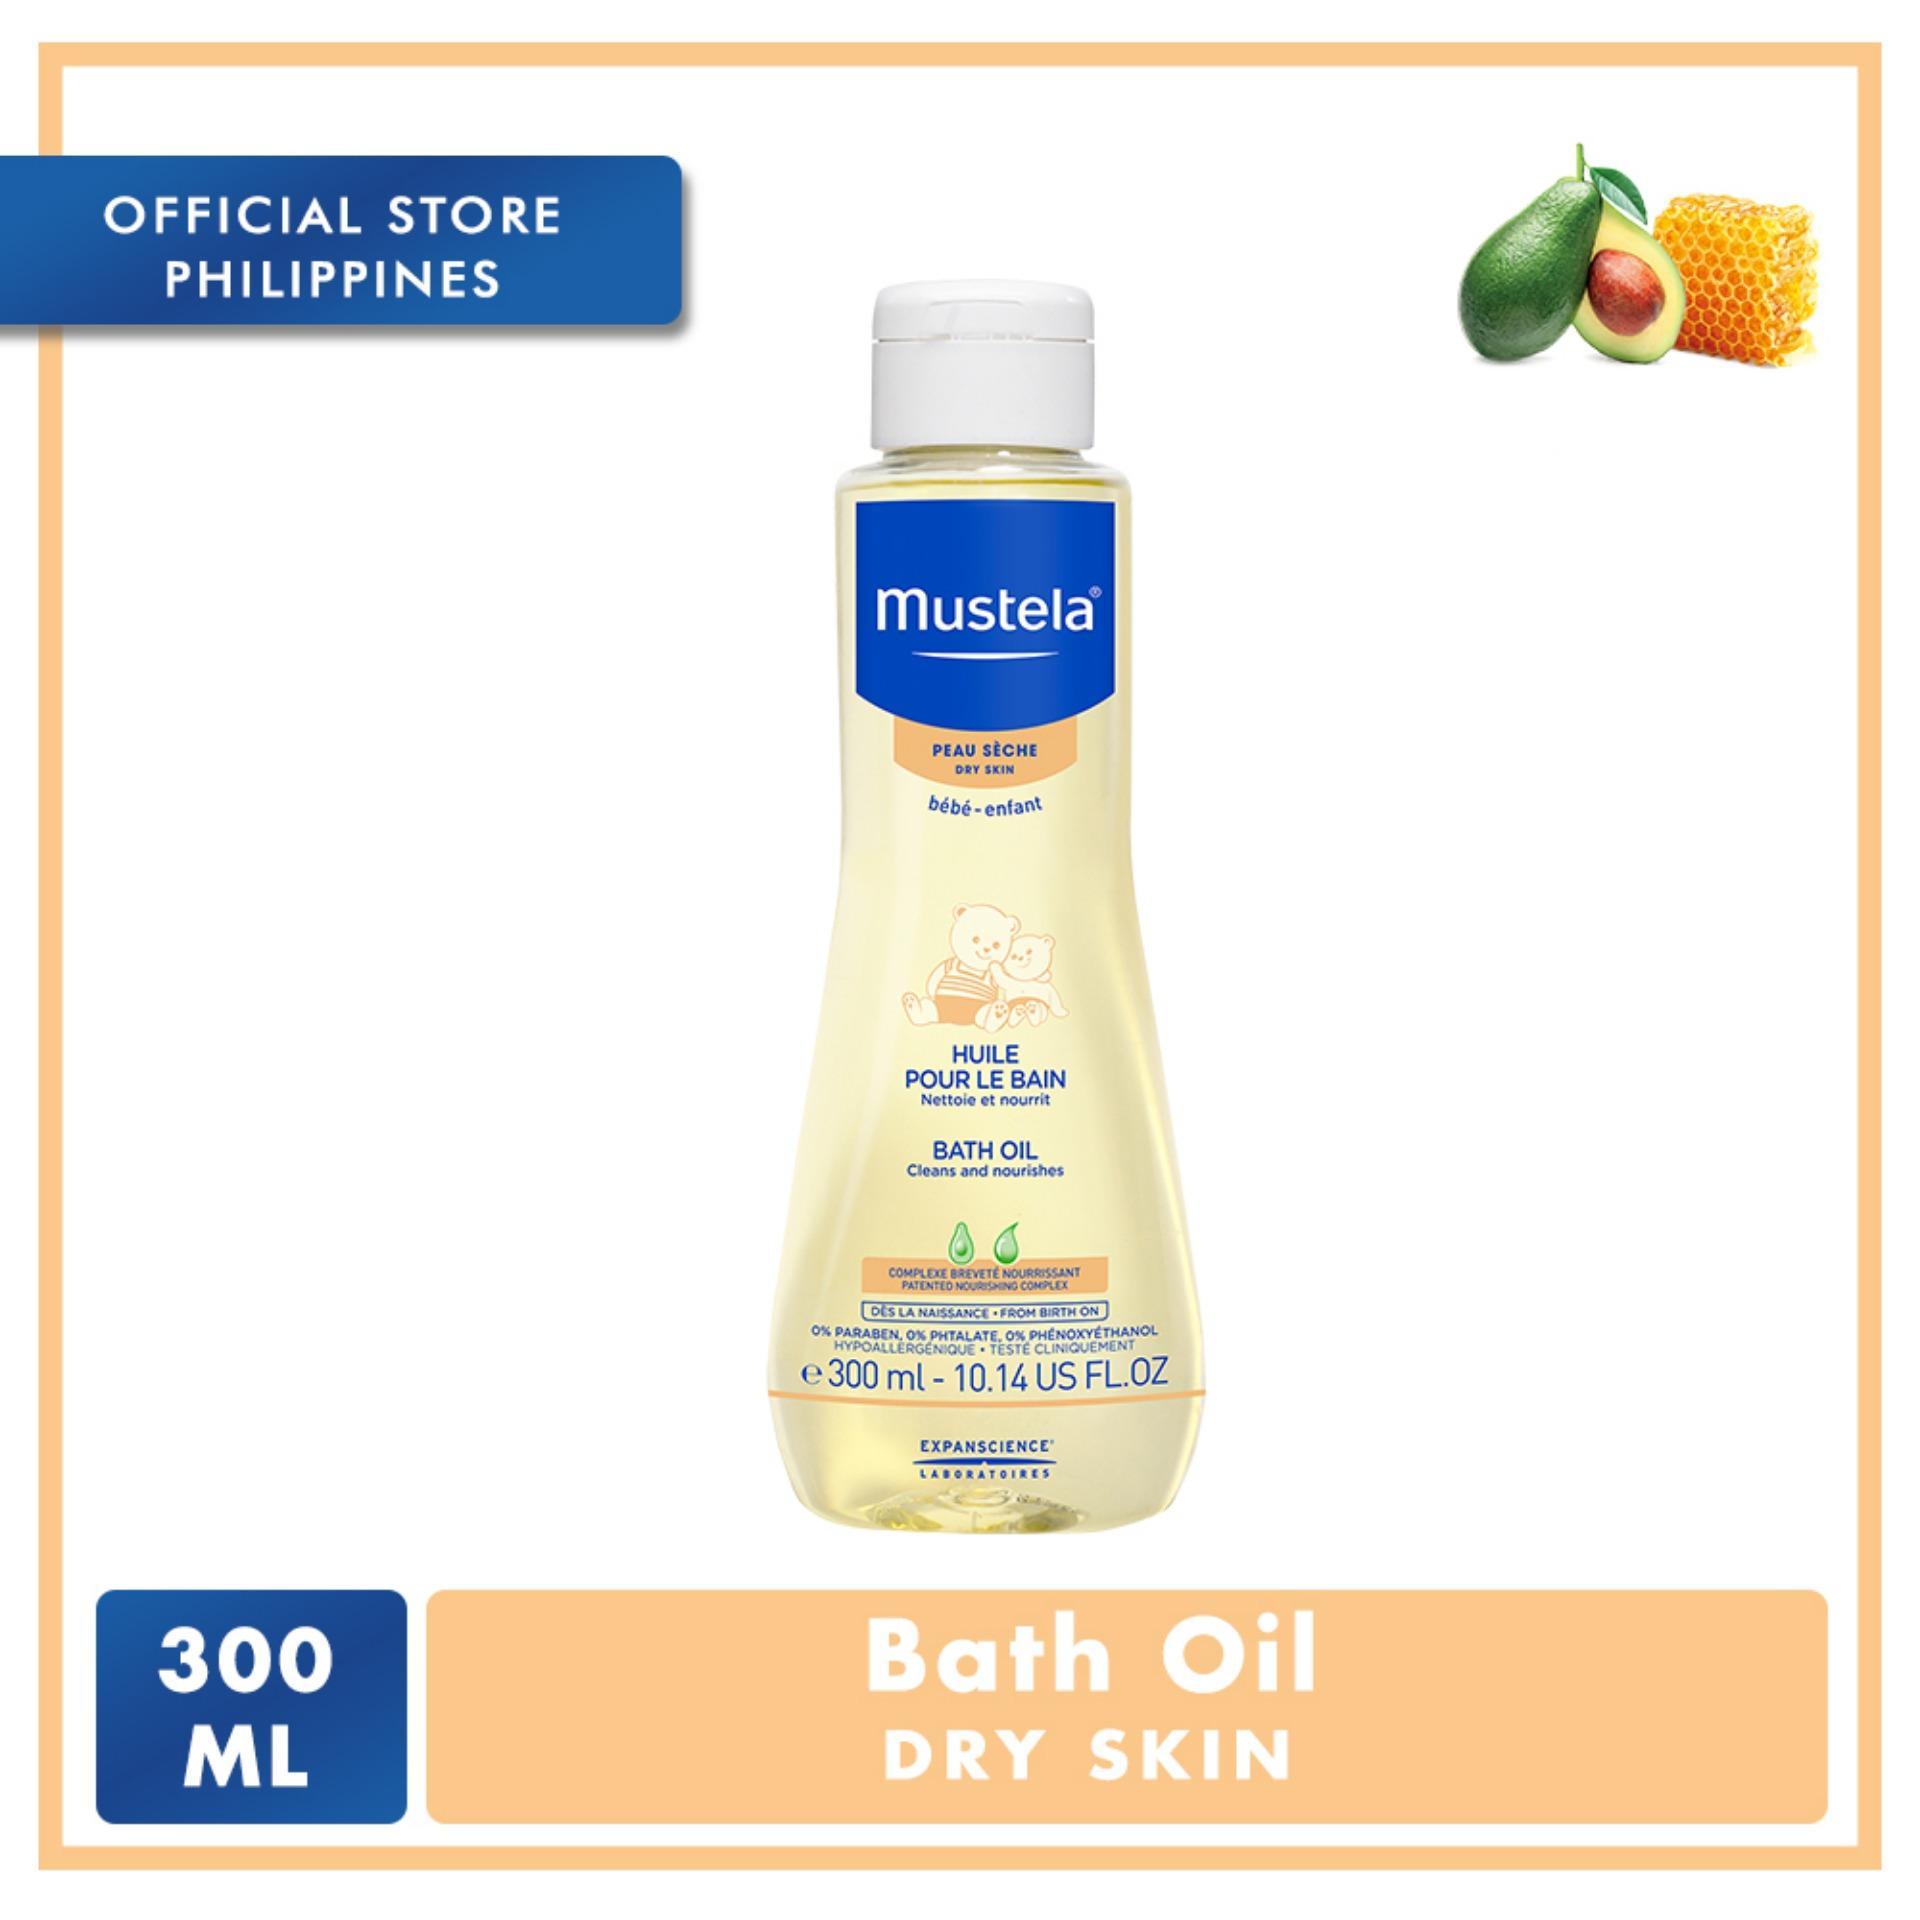 Mustela Bath Oil 300ml By Mustela Philippines.